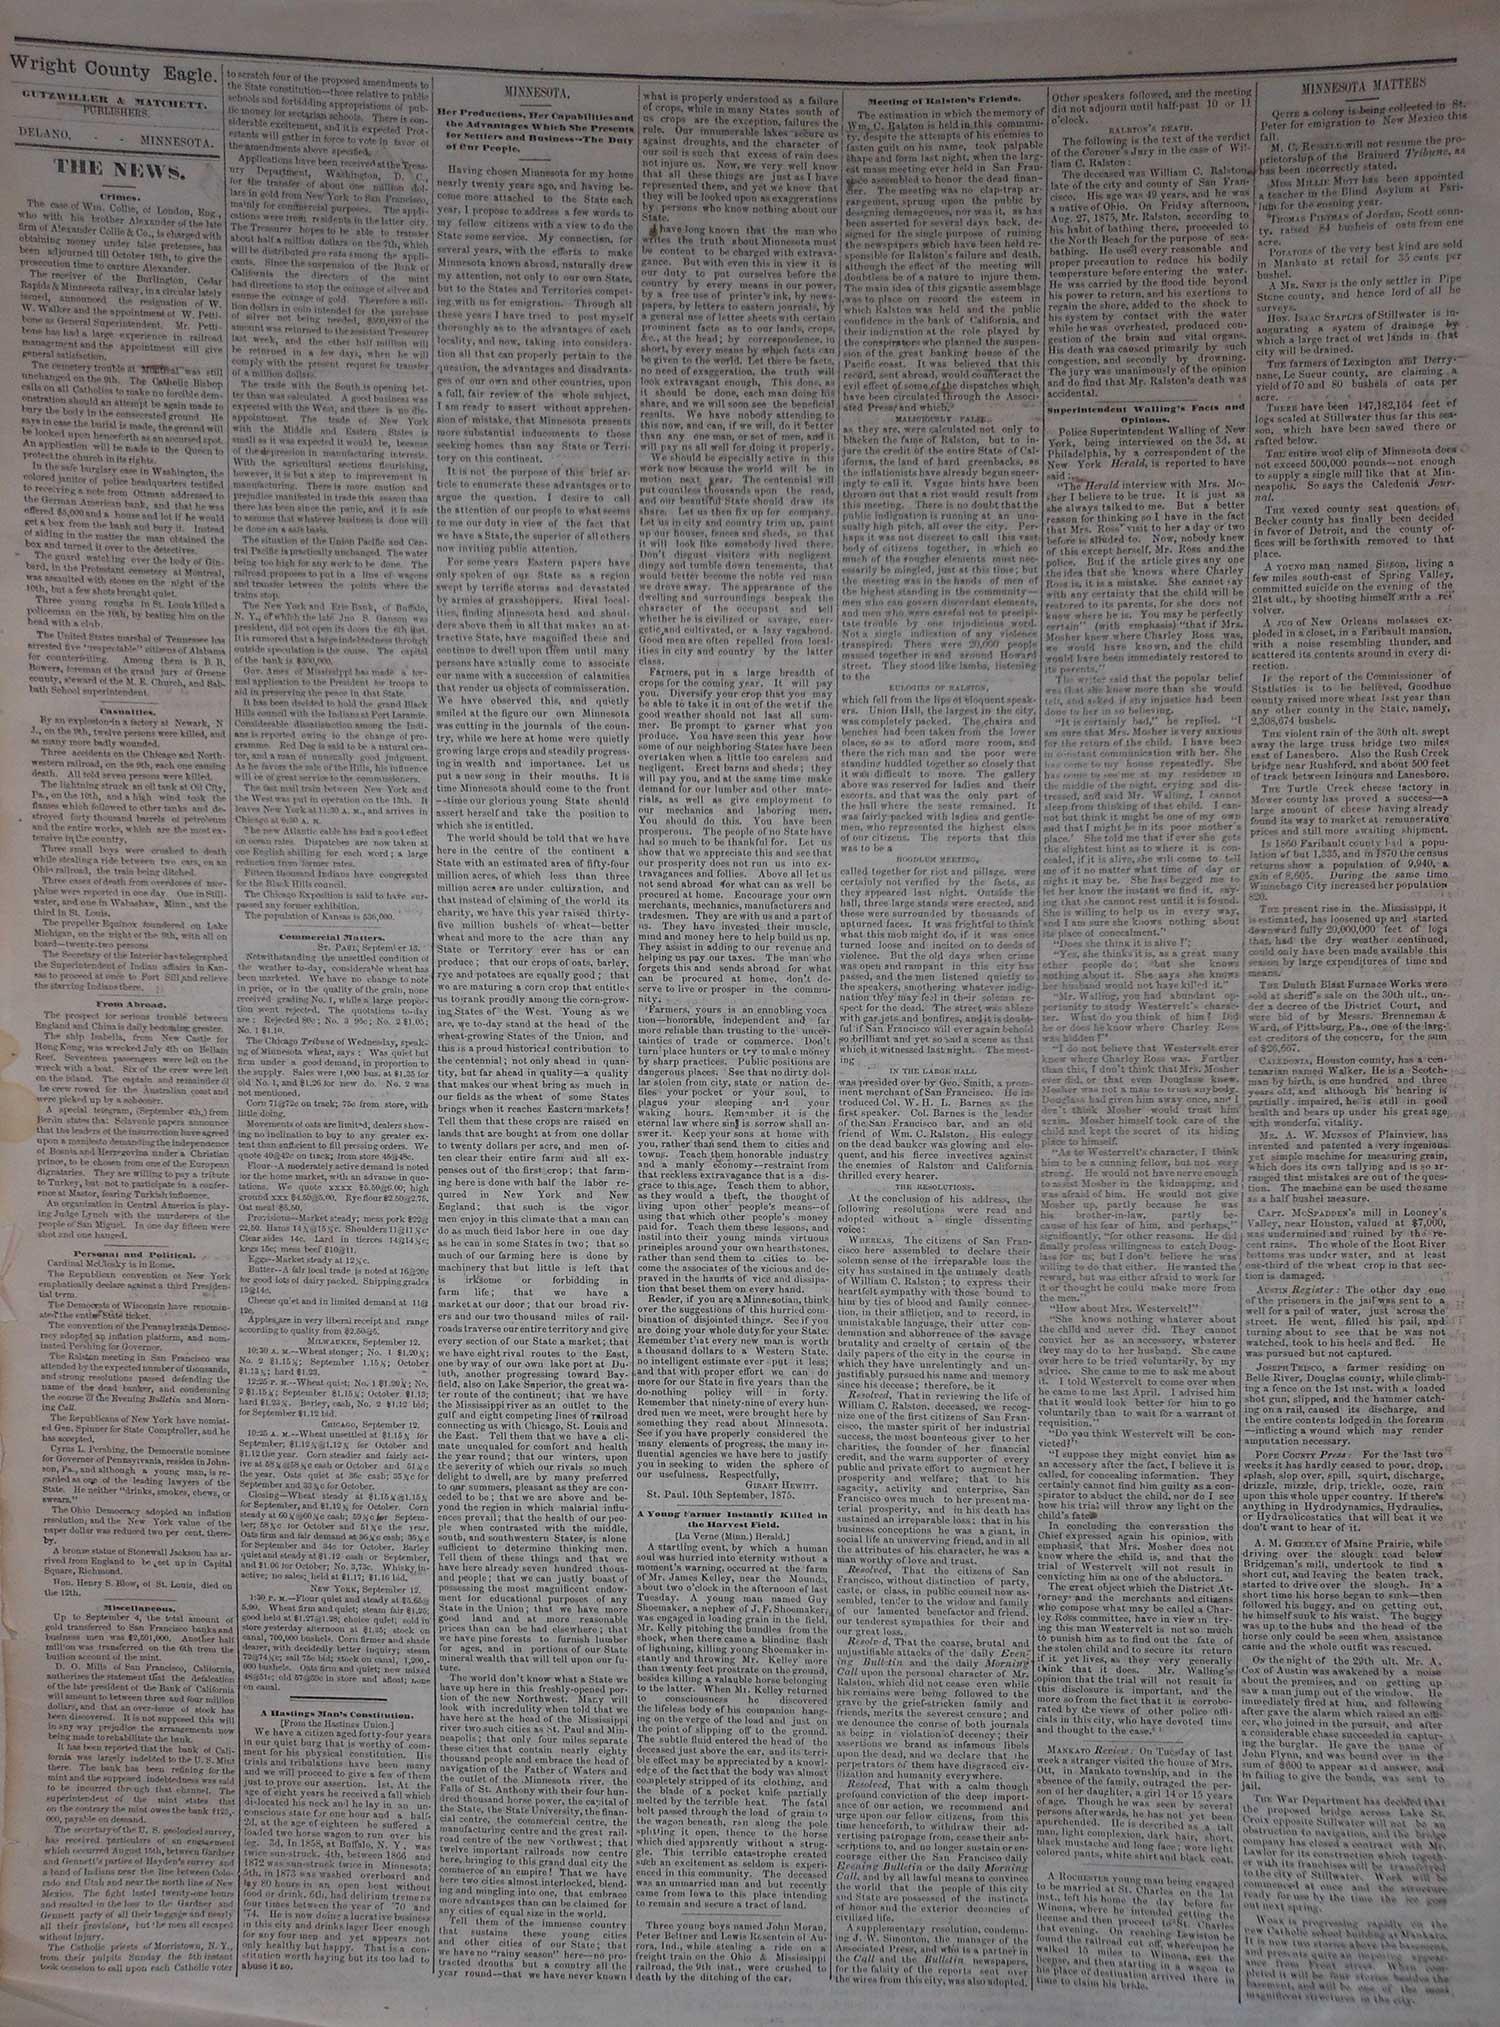 9/15/1875, p2